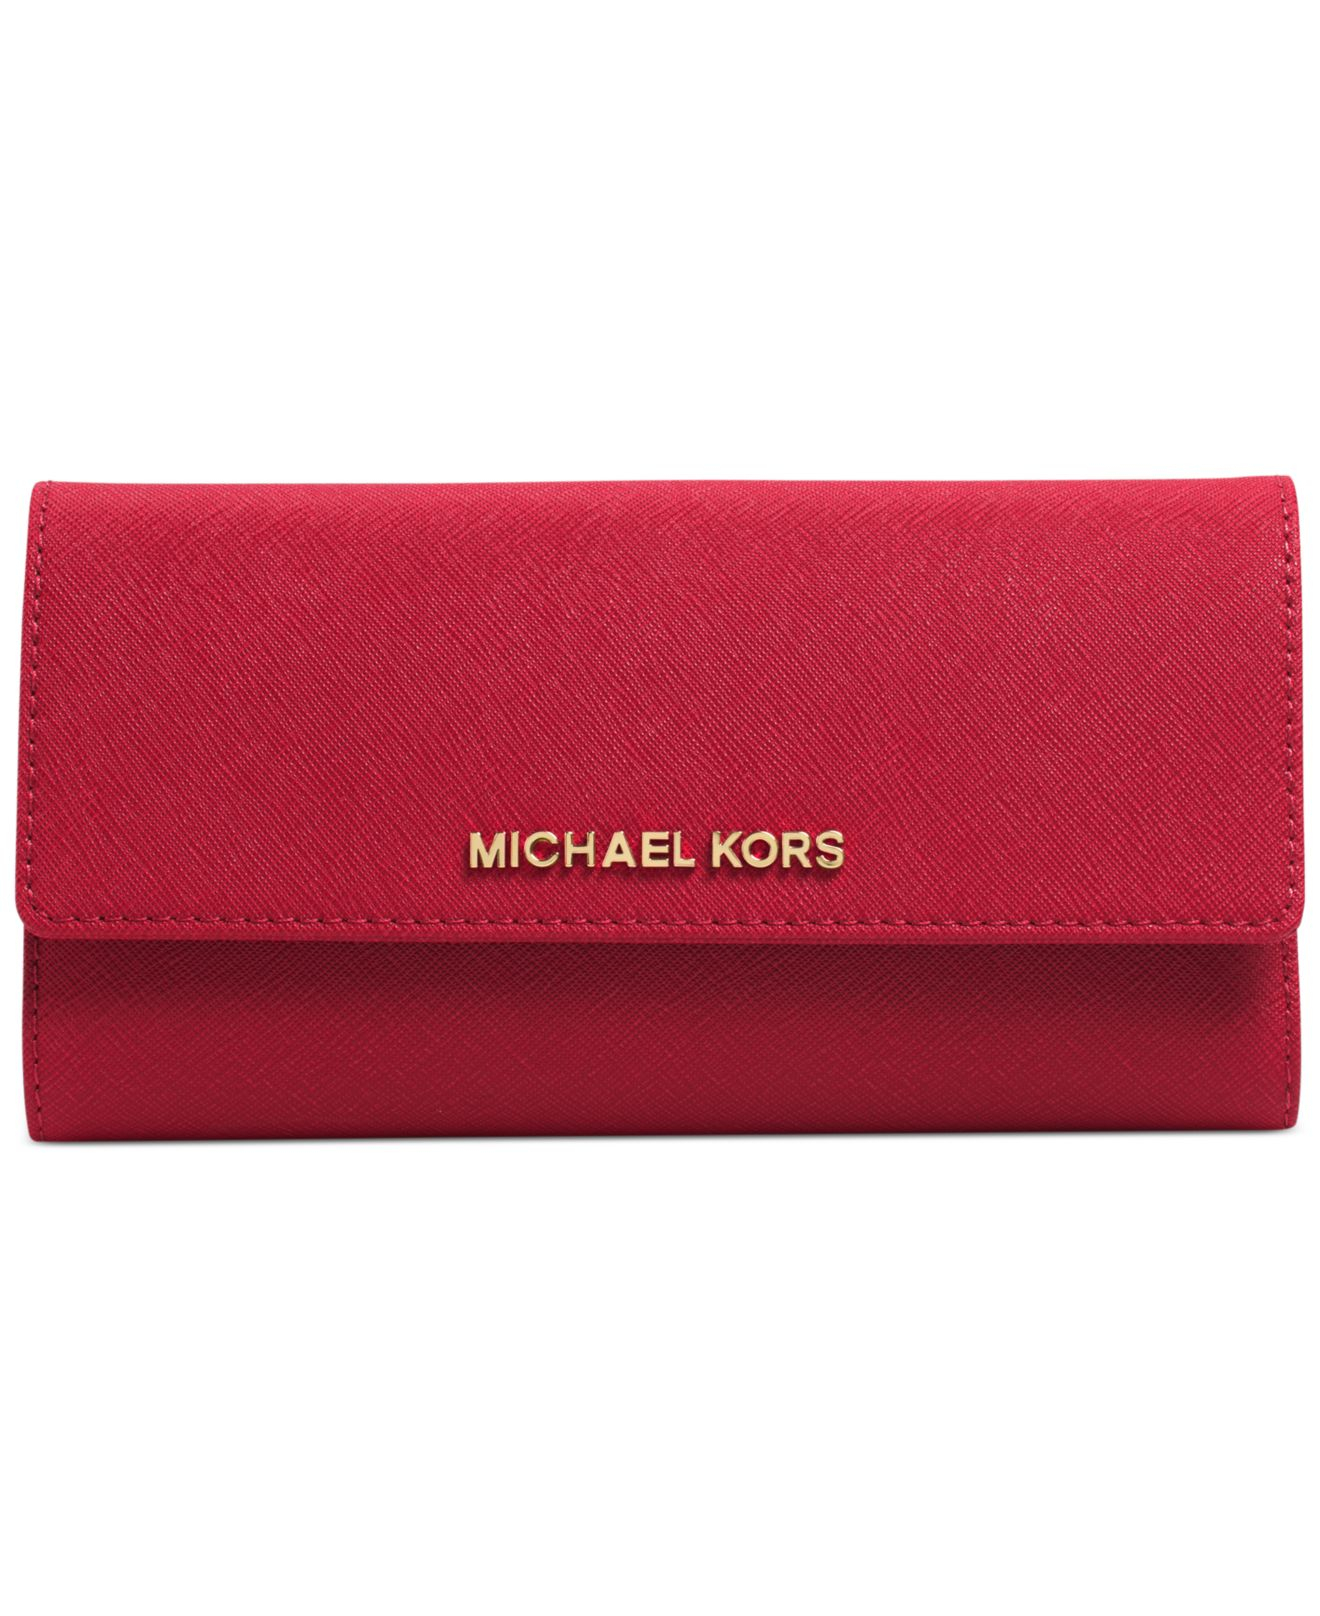 michael kors michael jet set travel checkbook wallet in